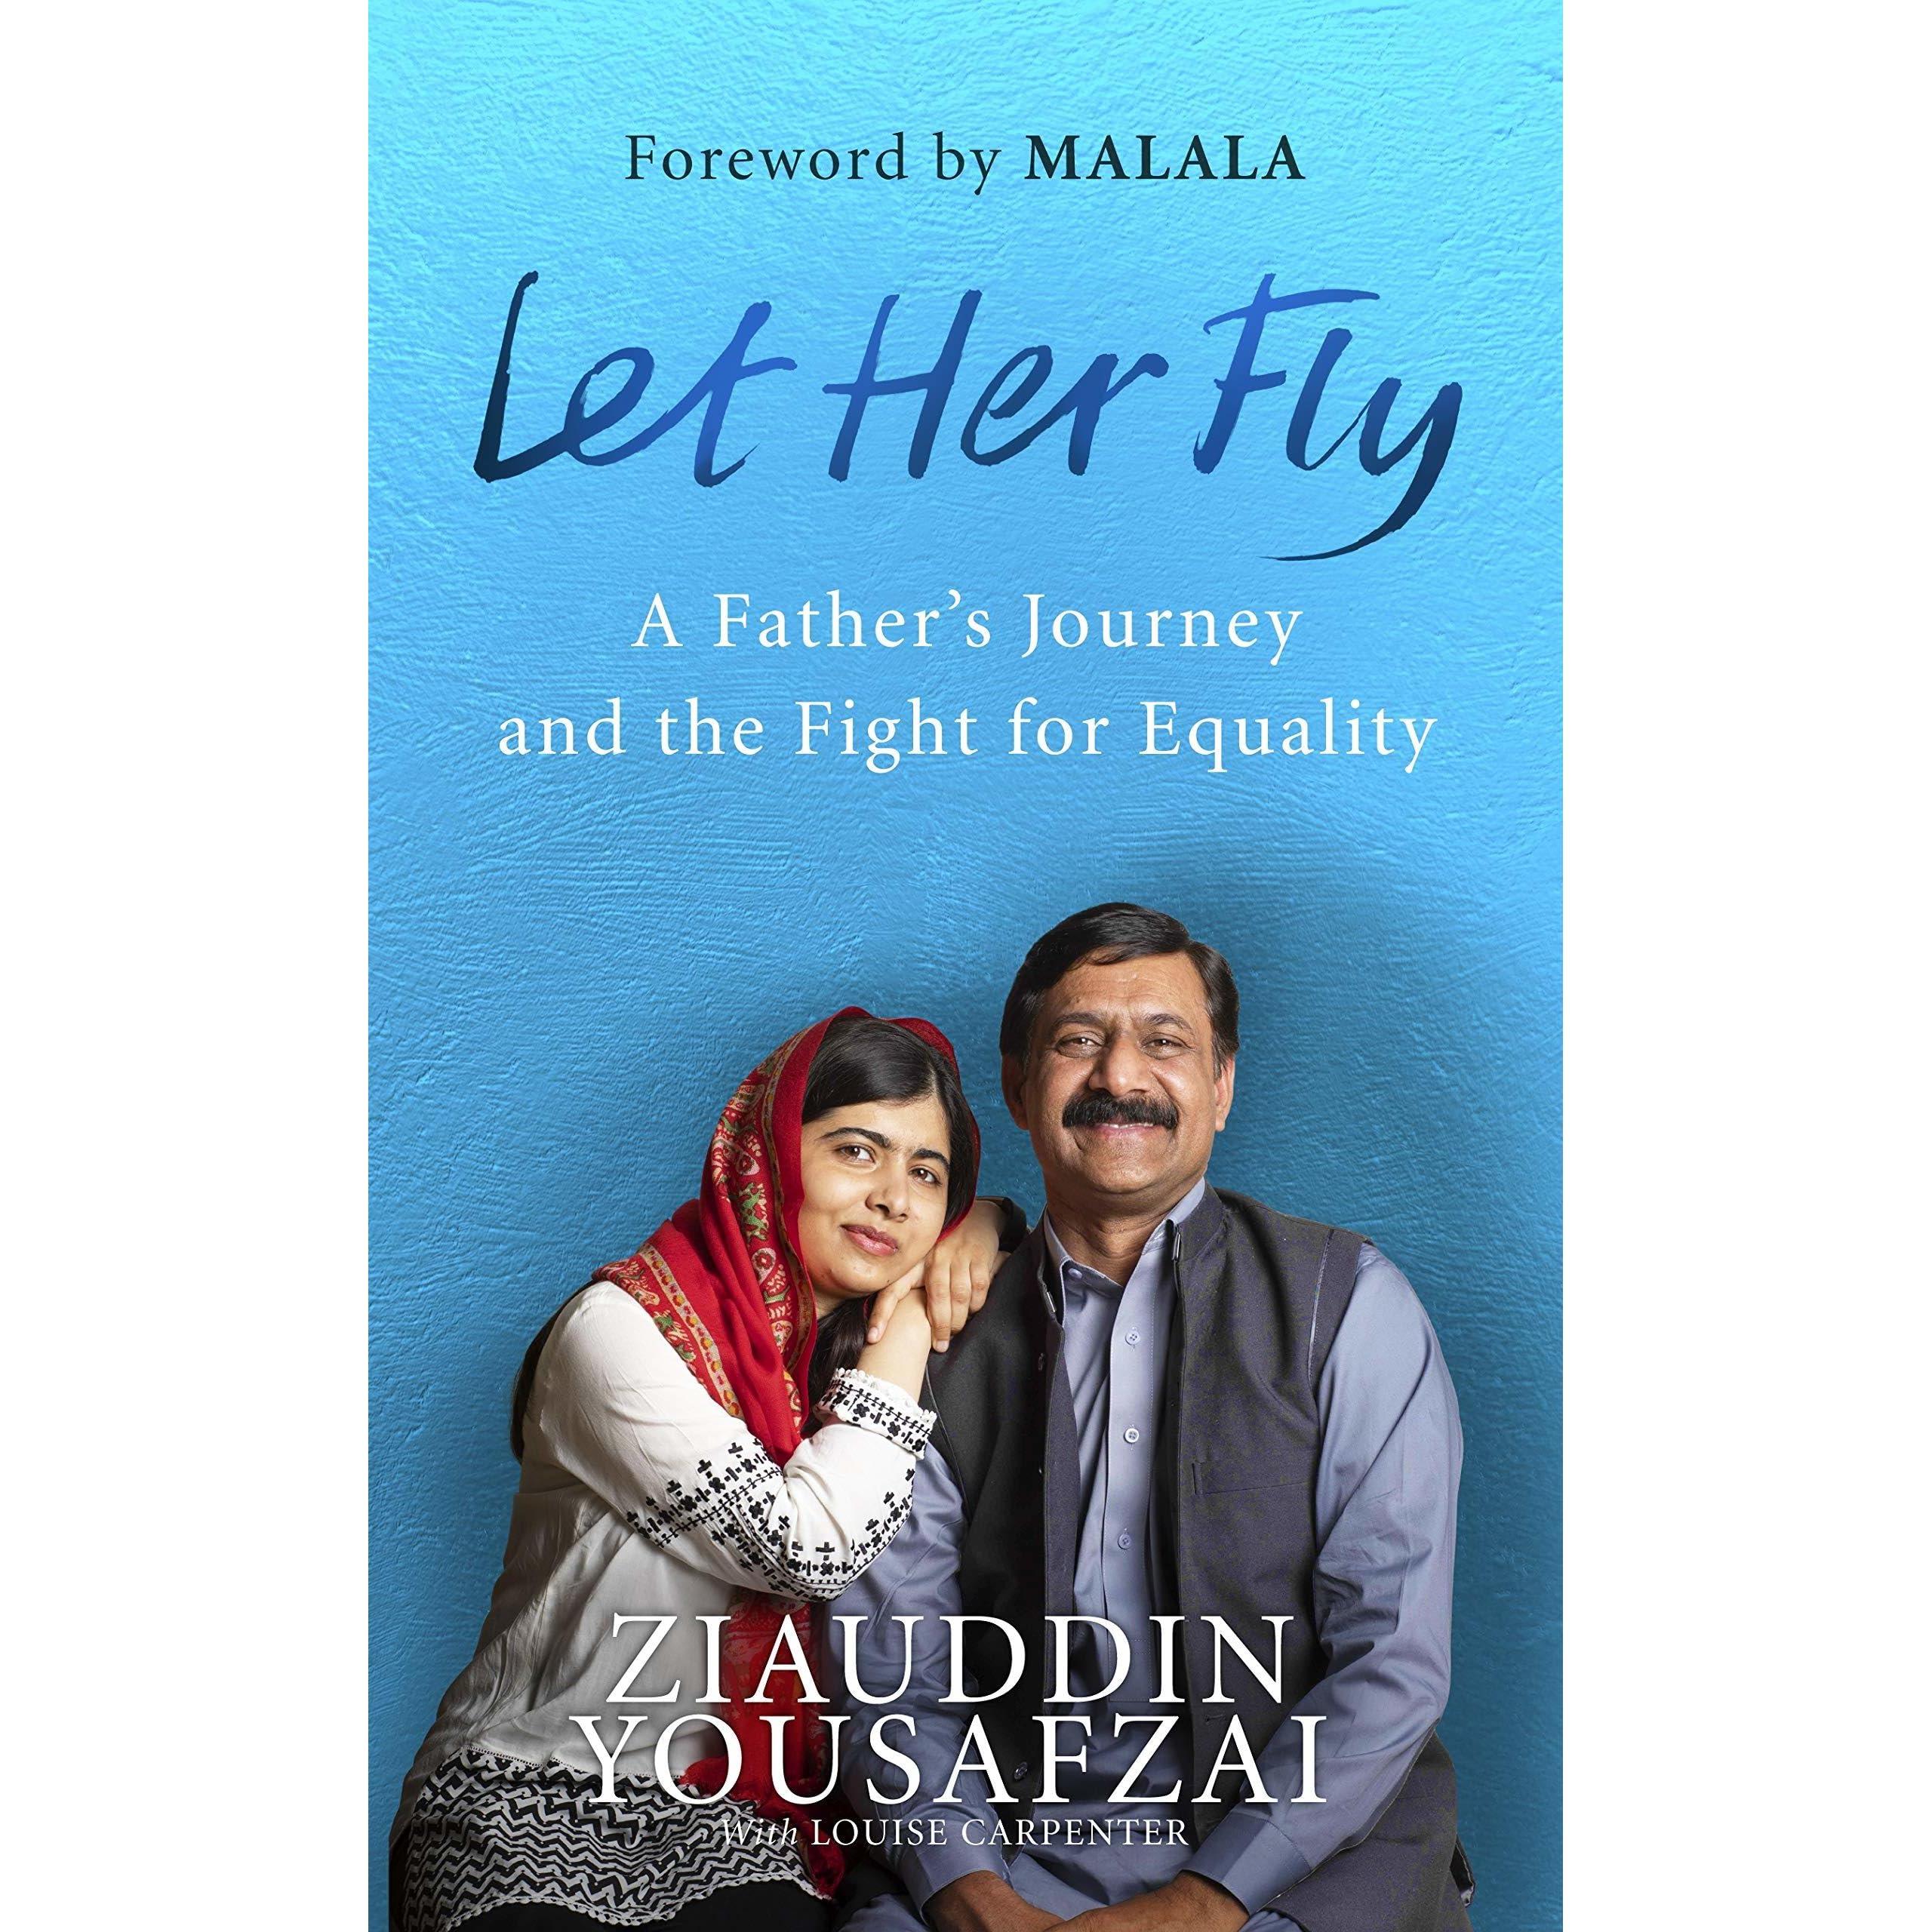 Malala Yousafzai Book In Urdu Pdf